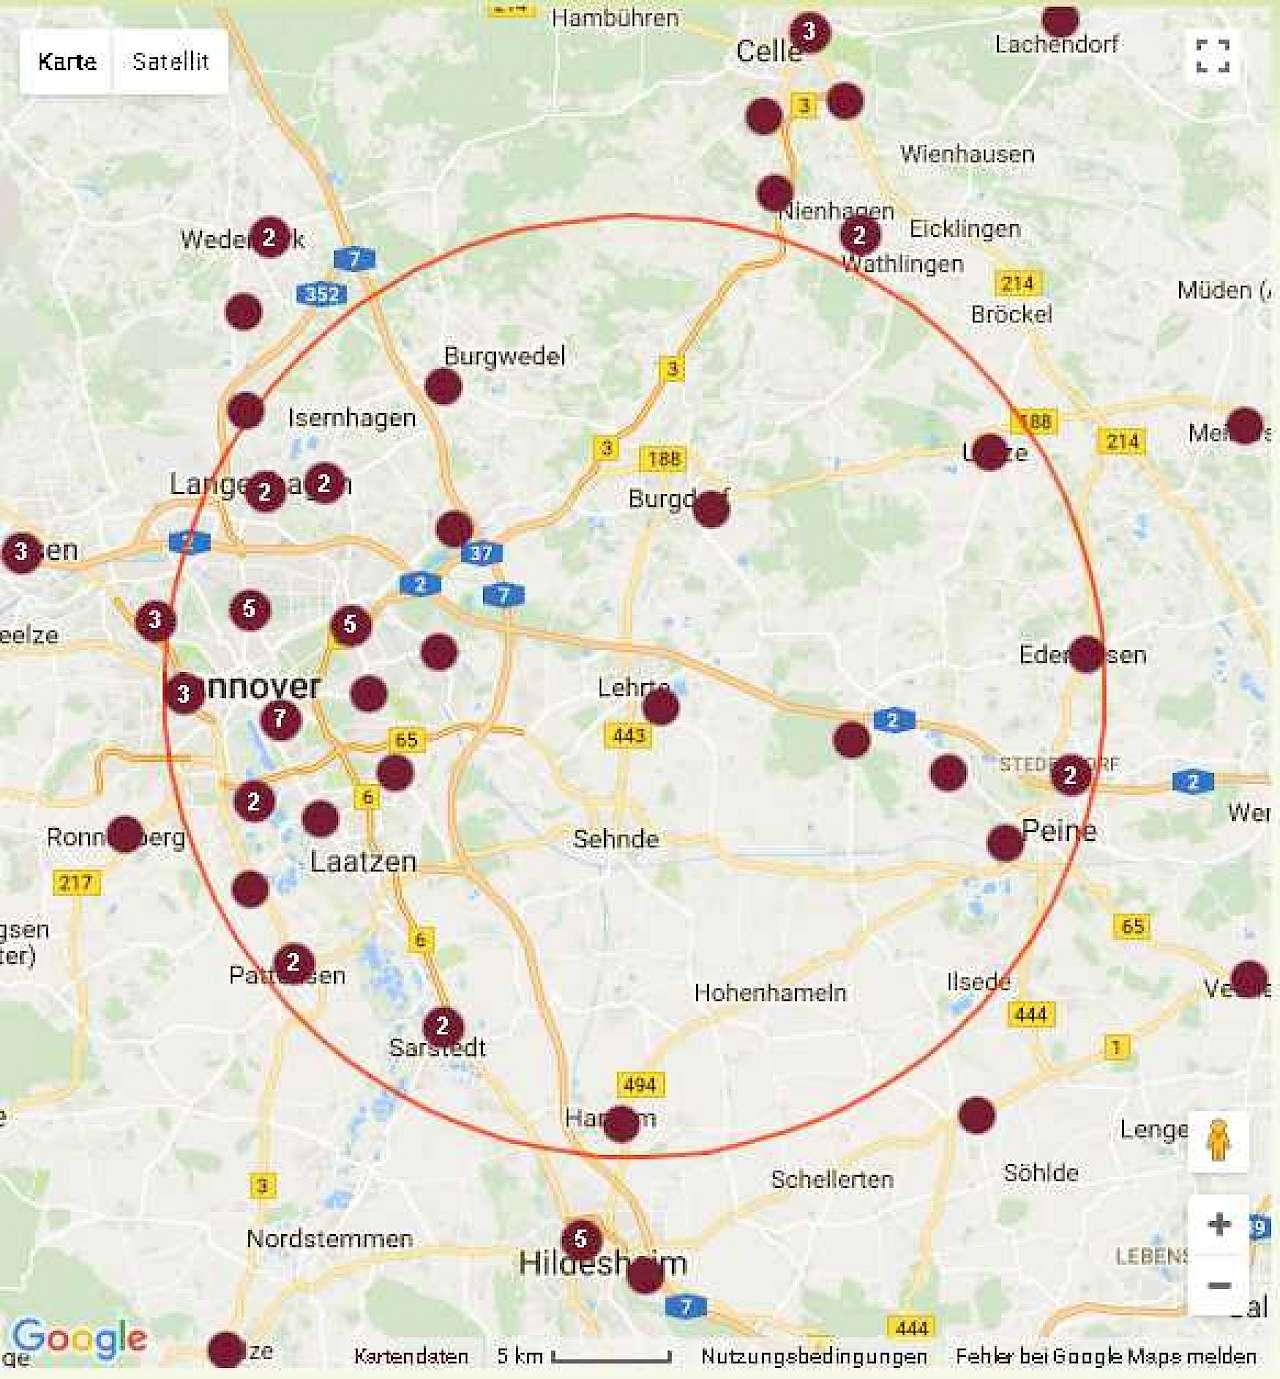 Hansefit Karte.Betriebssport 4 0 Beckmann Verlag